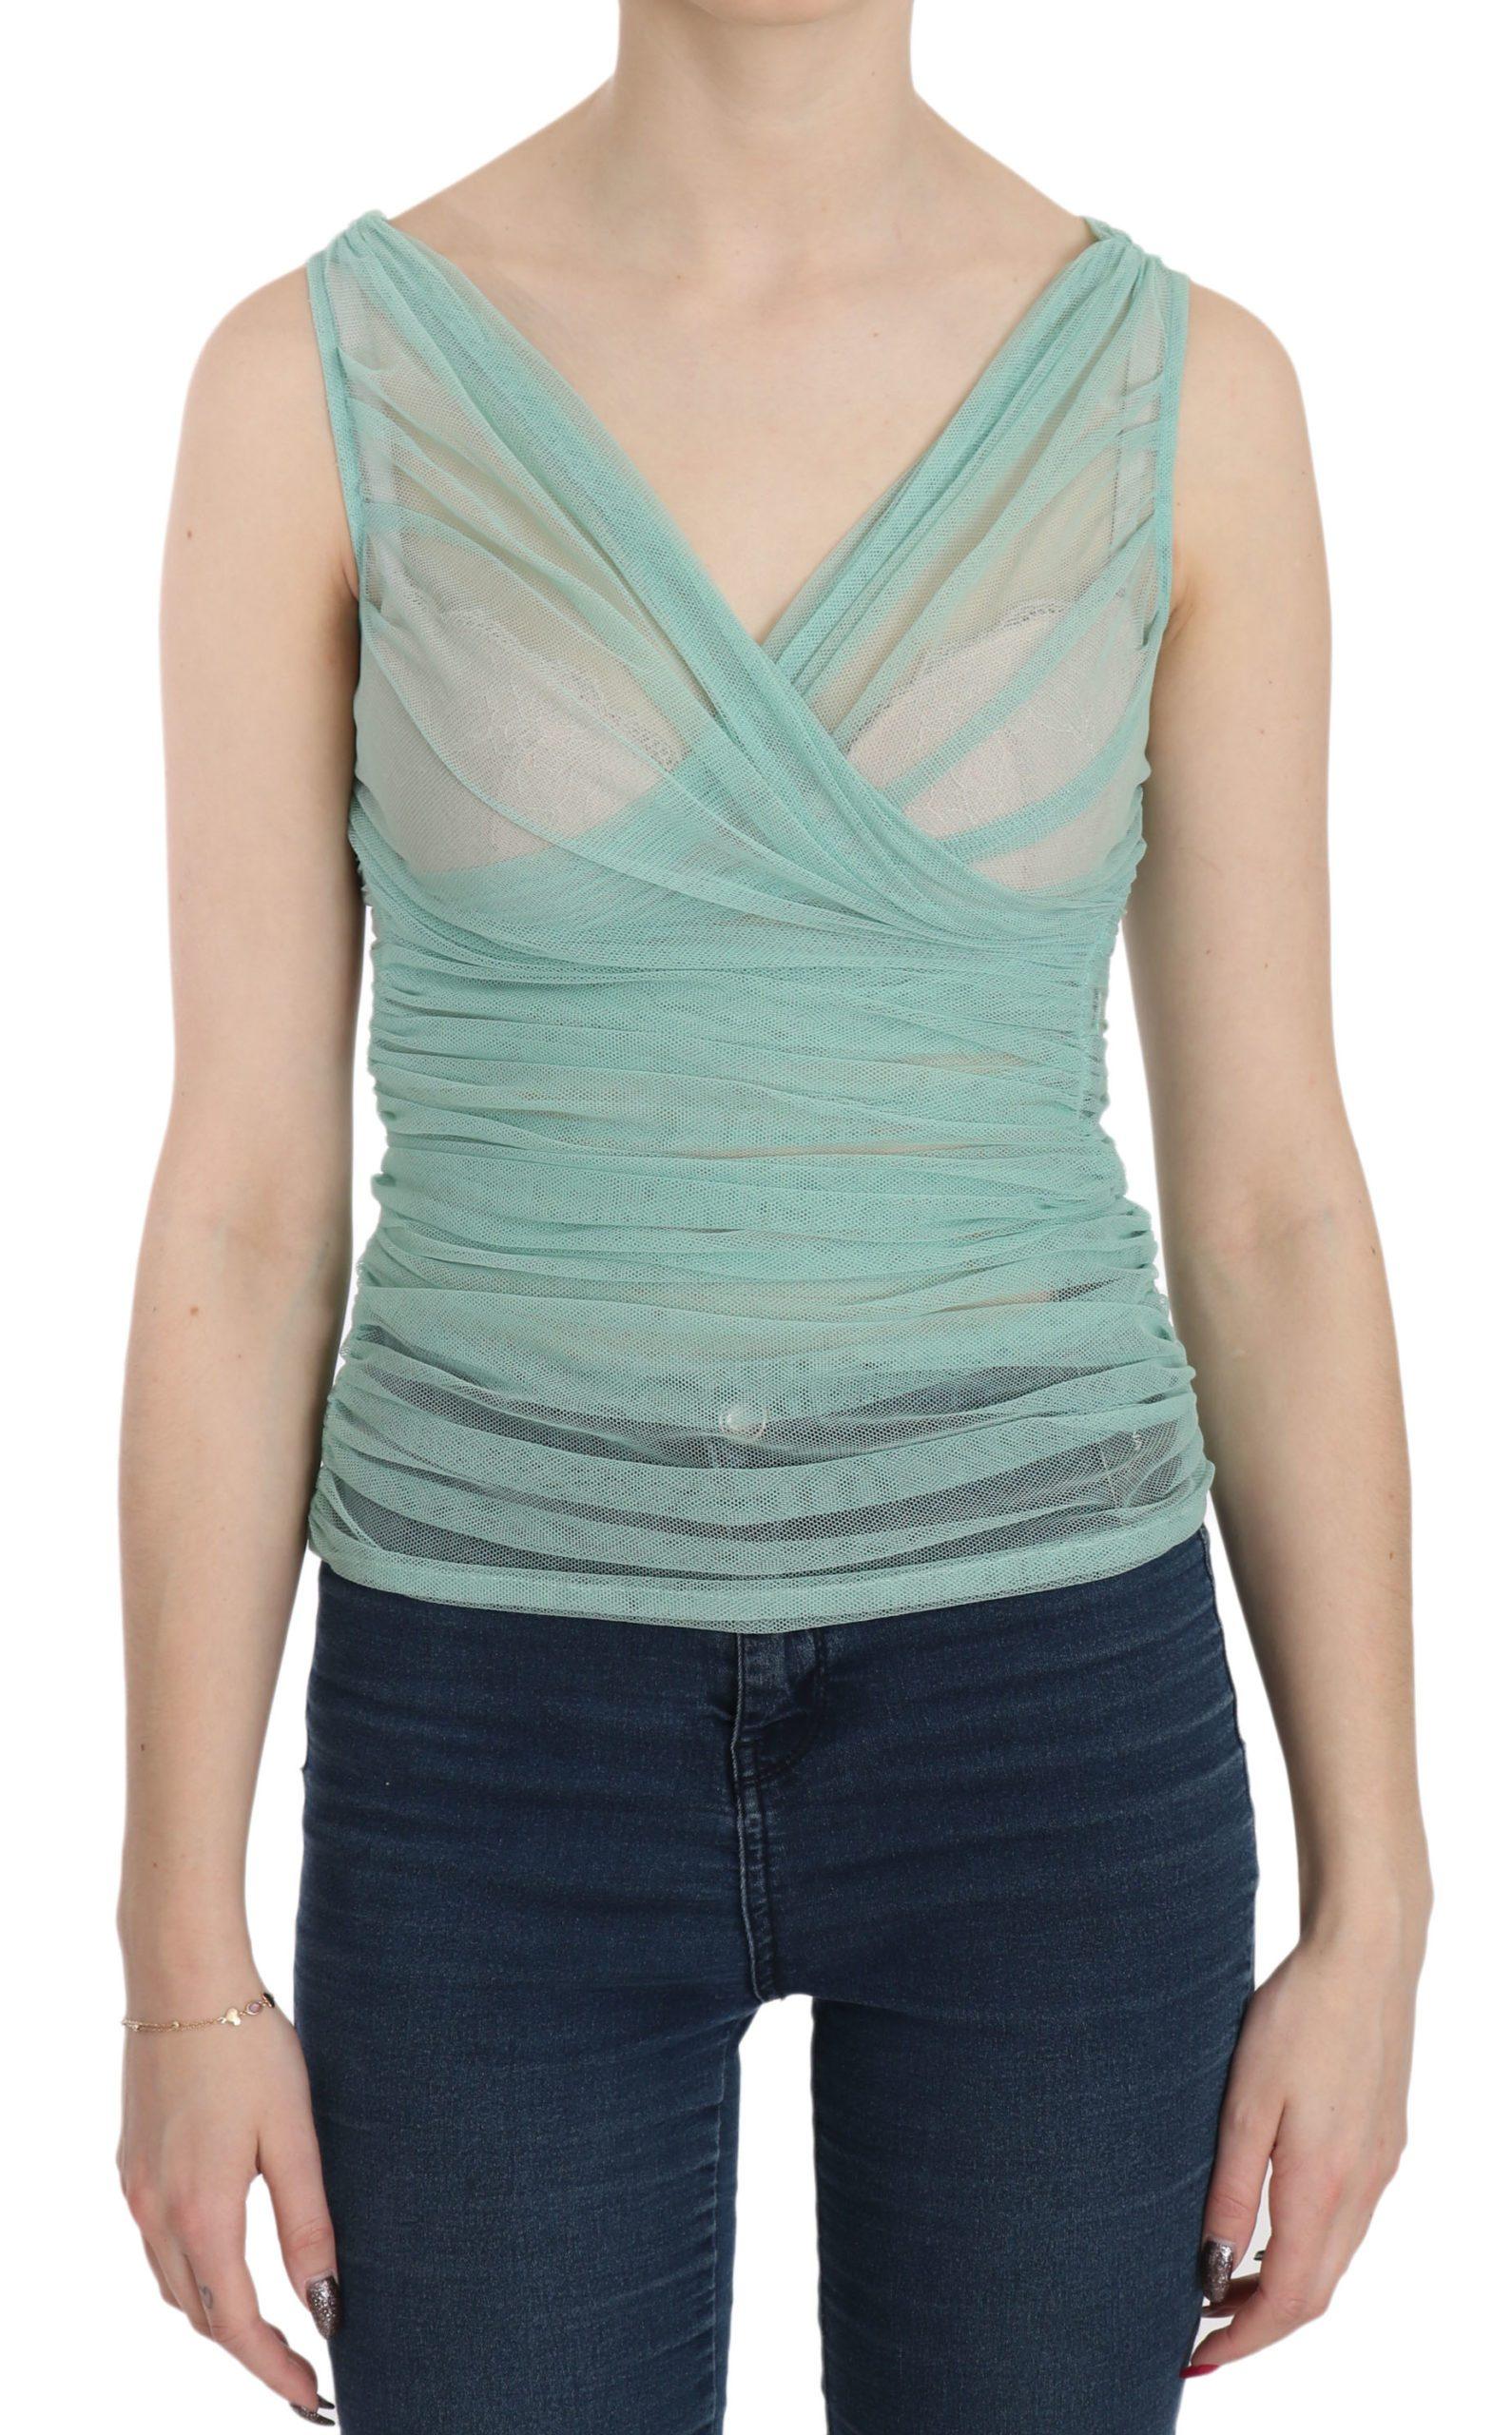 Dolce & Gabbana Women's Stretch Mesh Top Green TSH3399 - IT46   L